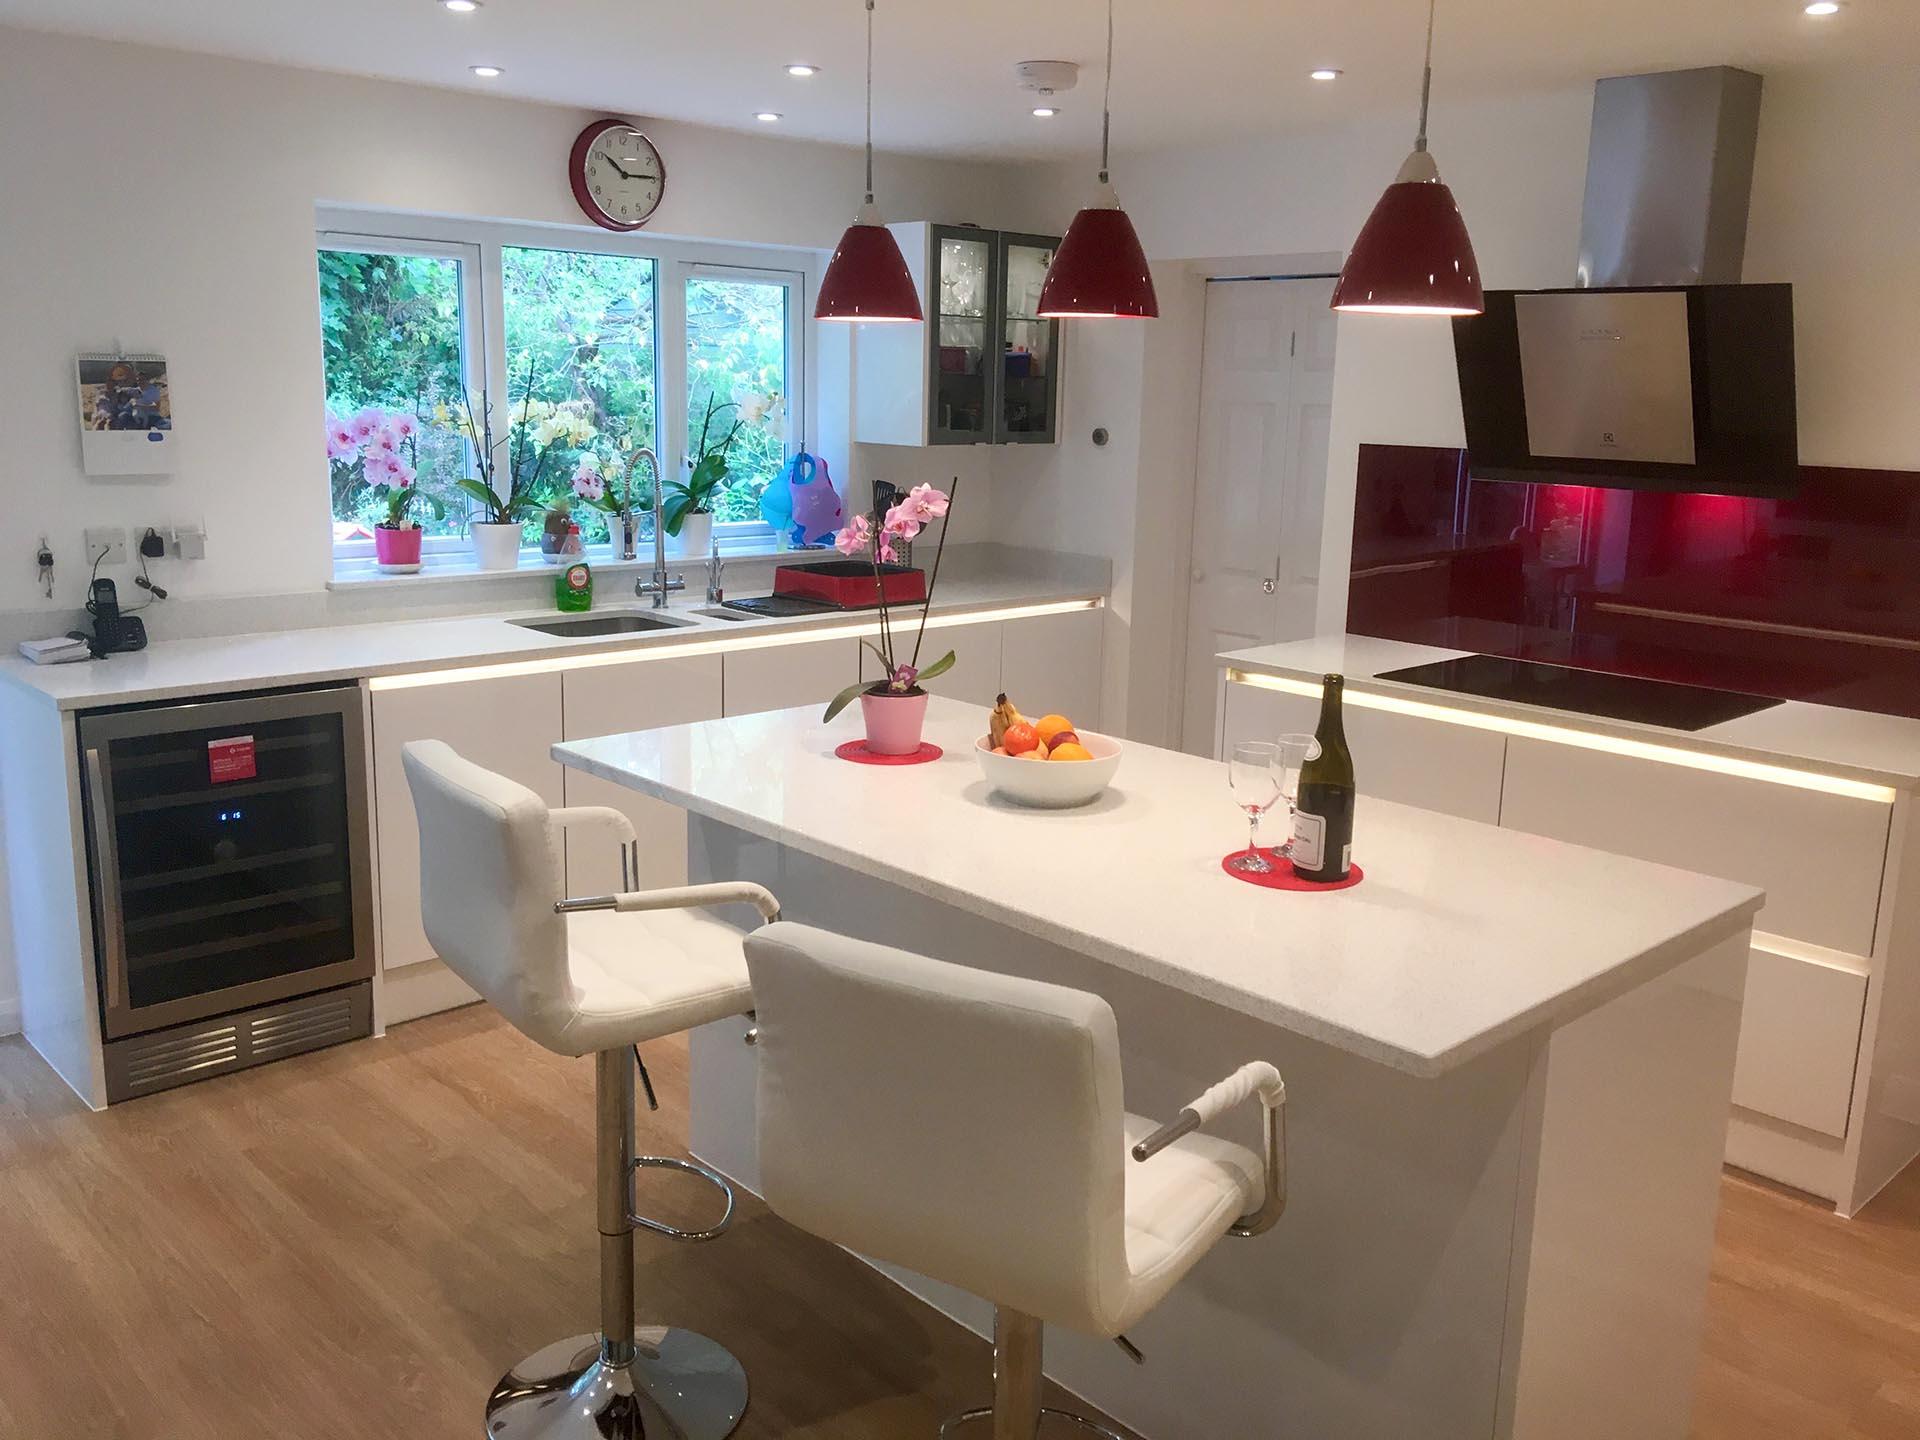 Kent Kitchen refit by Joseph Projects